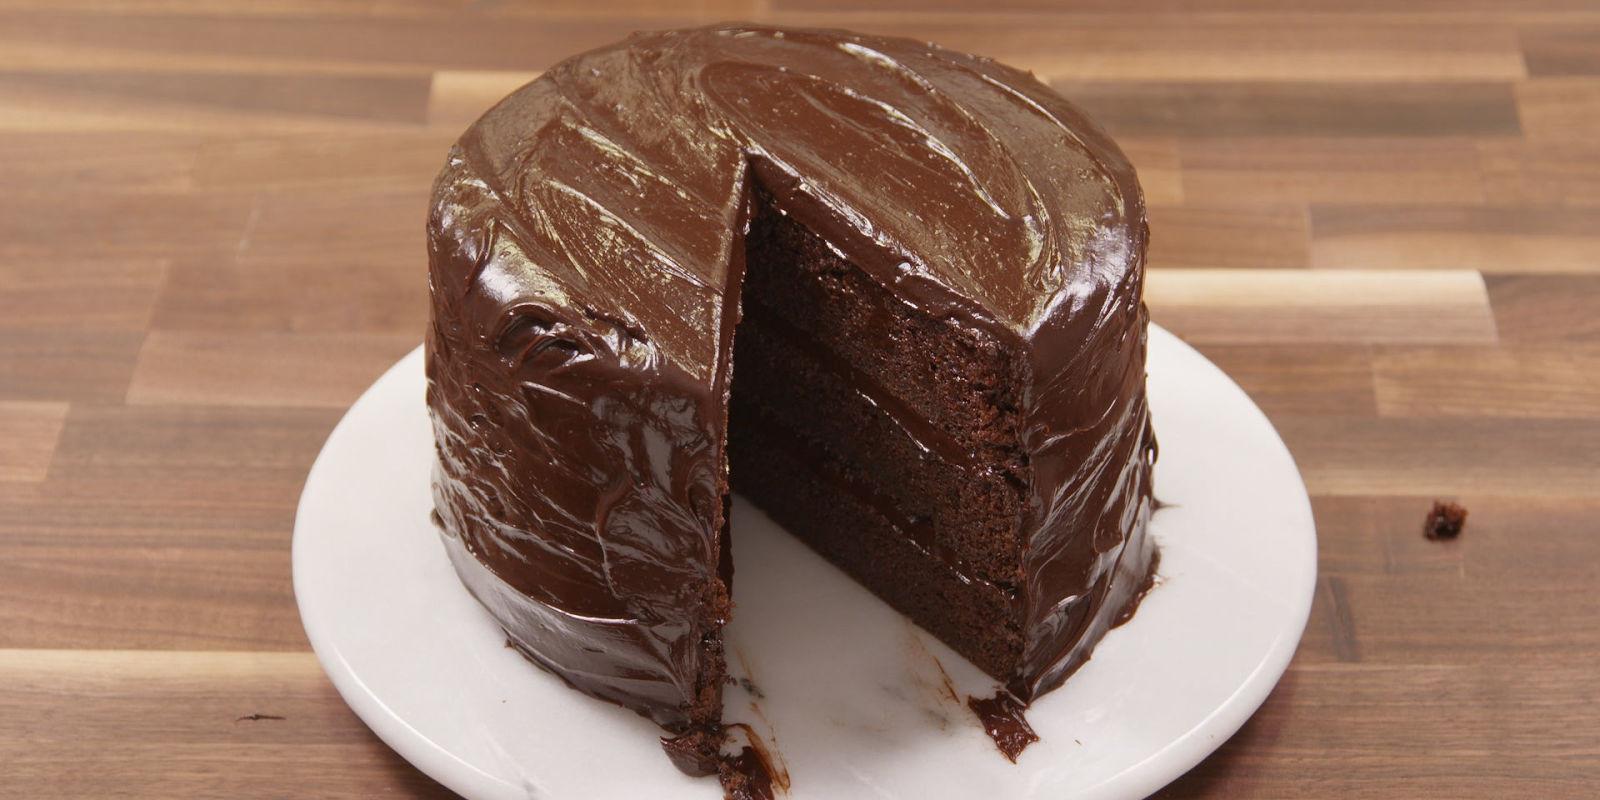 How To Cake It Chocolate Cake  Best Chocolate Fudge Cake Recipe How To Make Chocolate